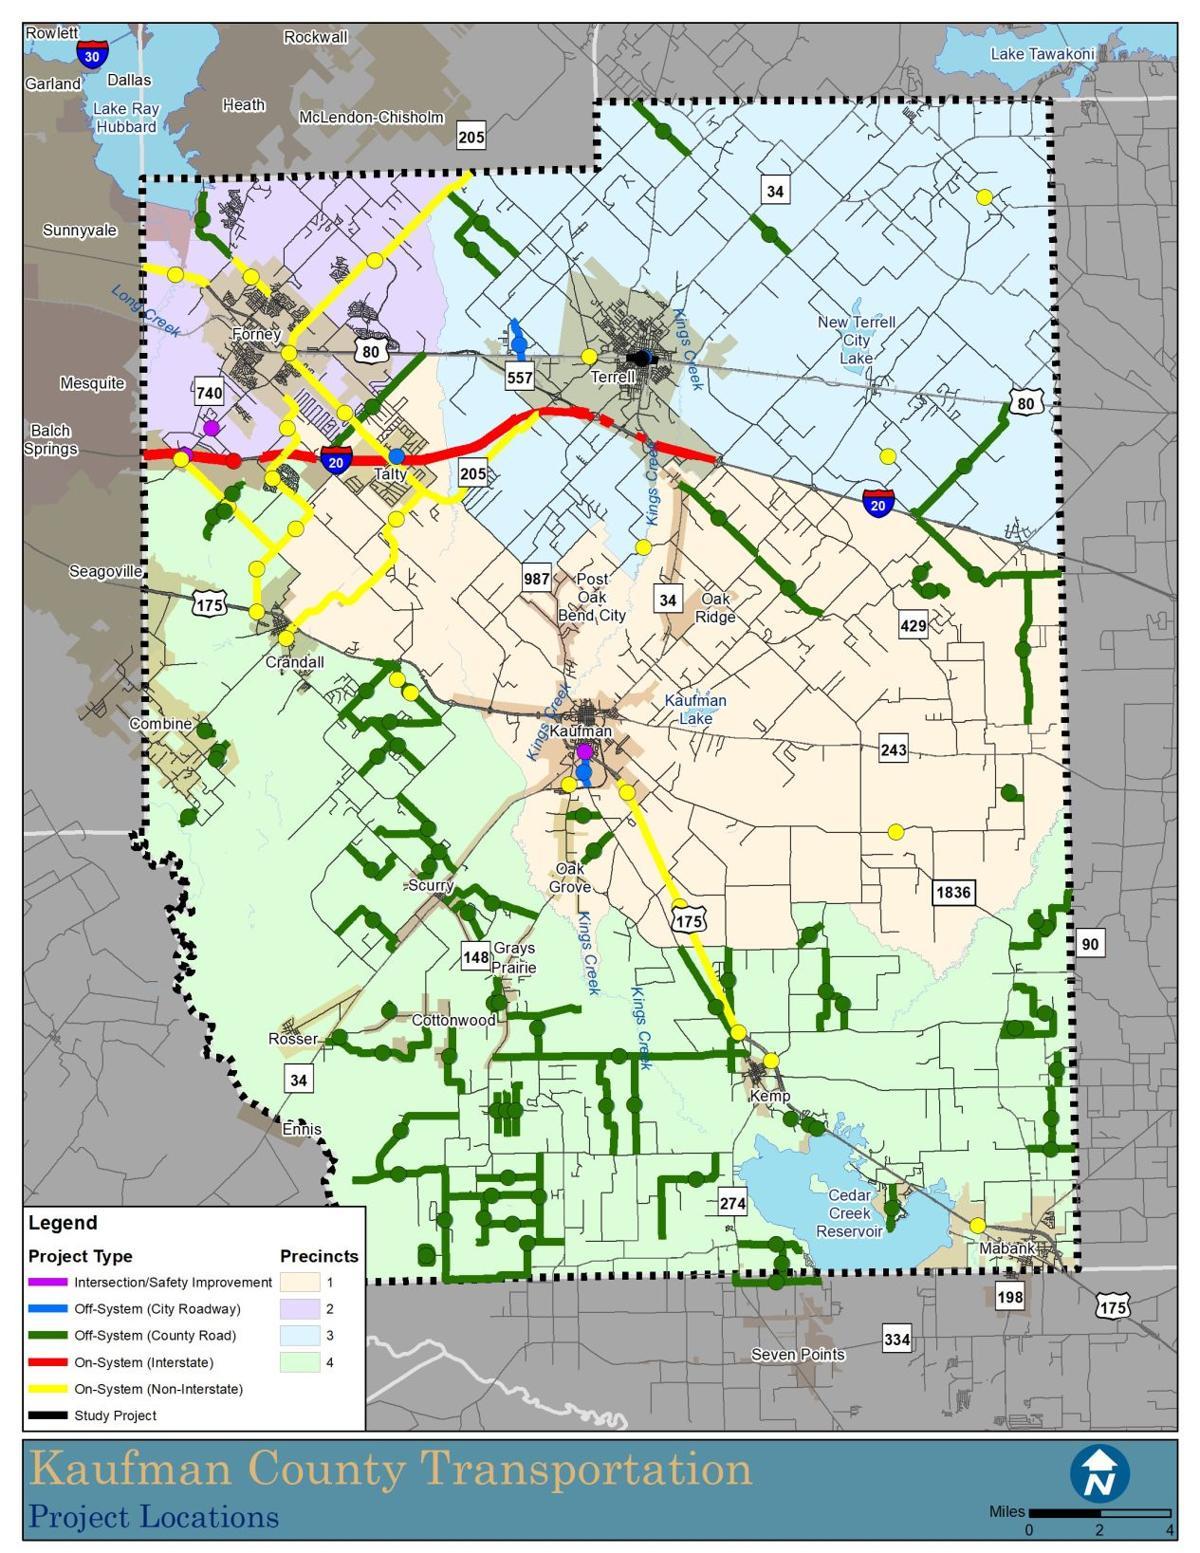 Kaufman-County-Transportation-Bond-Project-Map.jpg